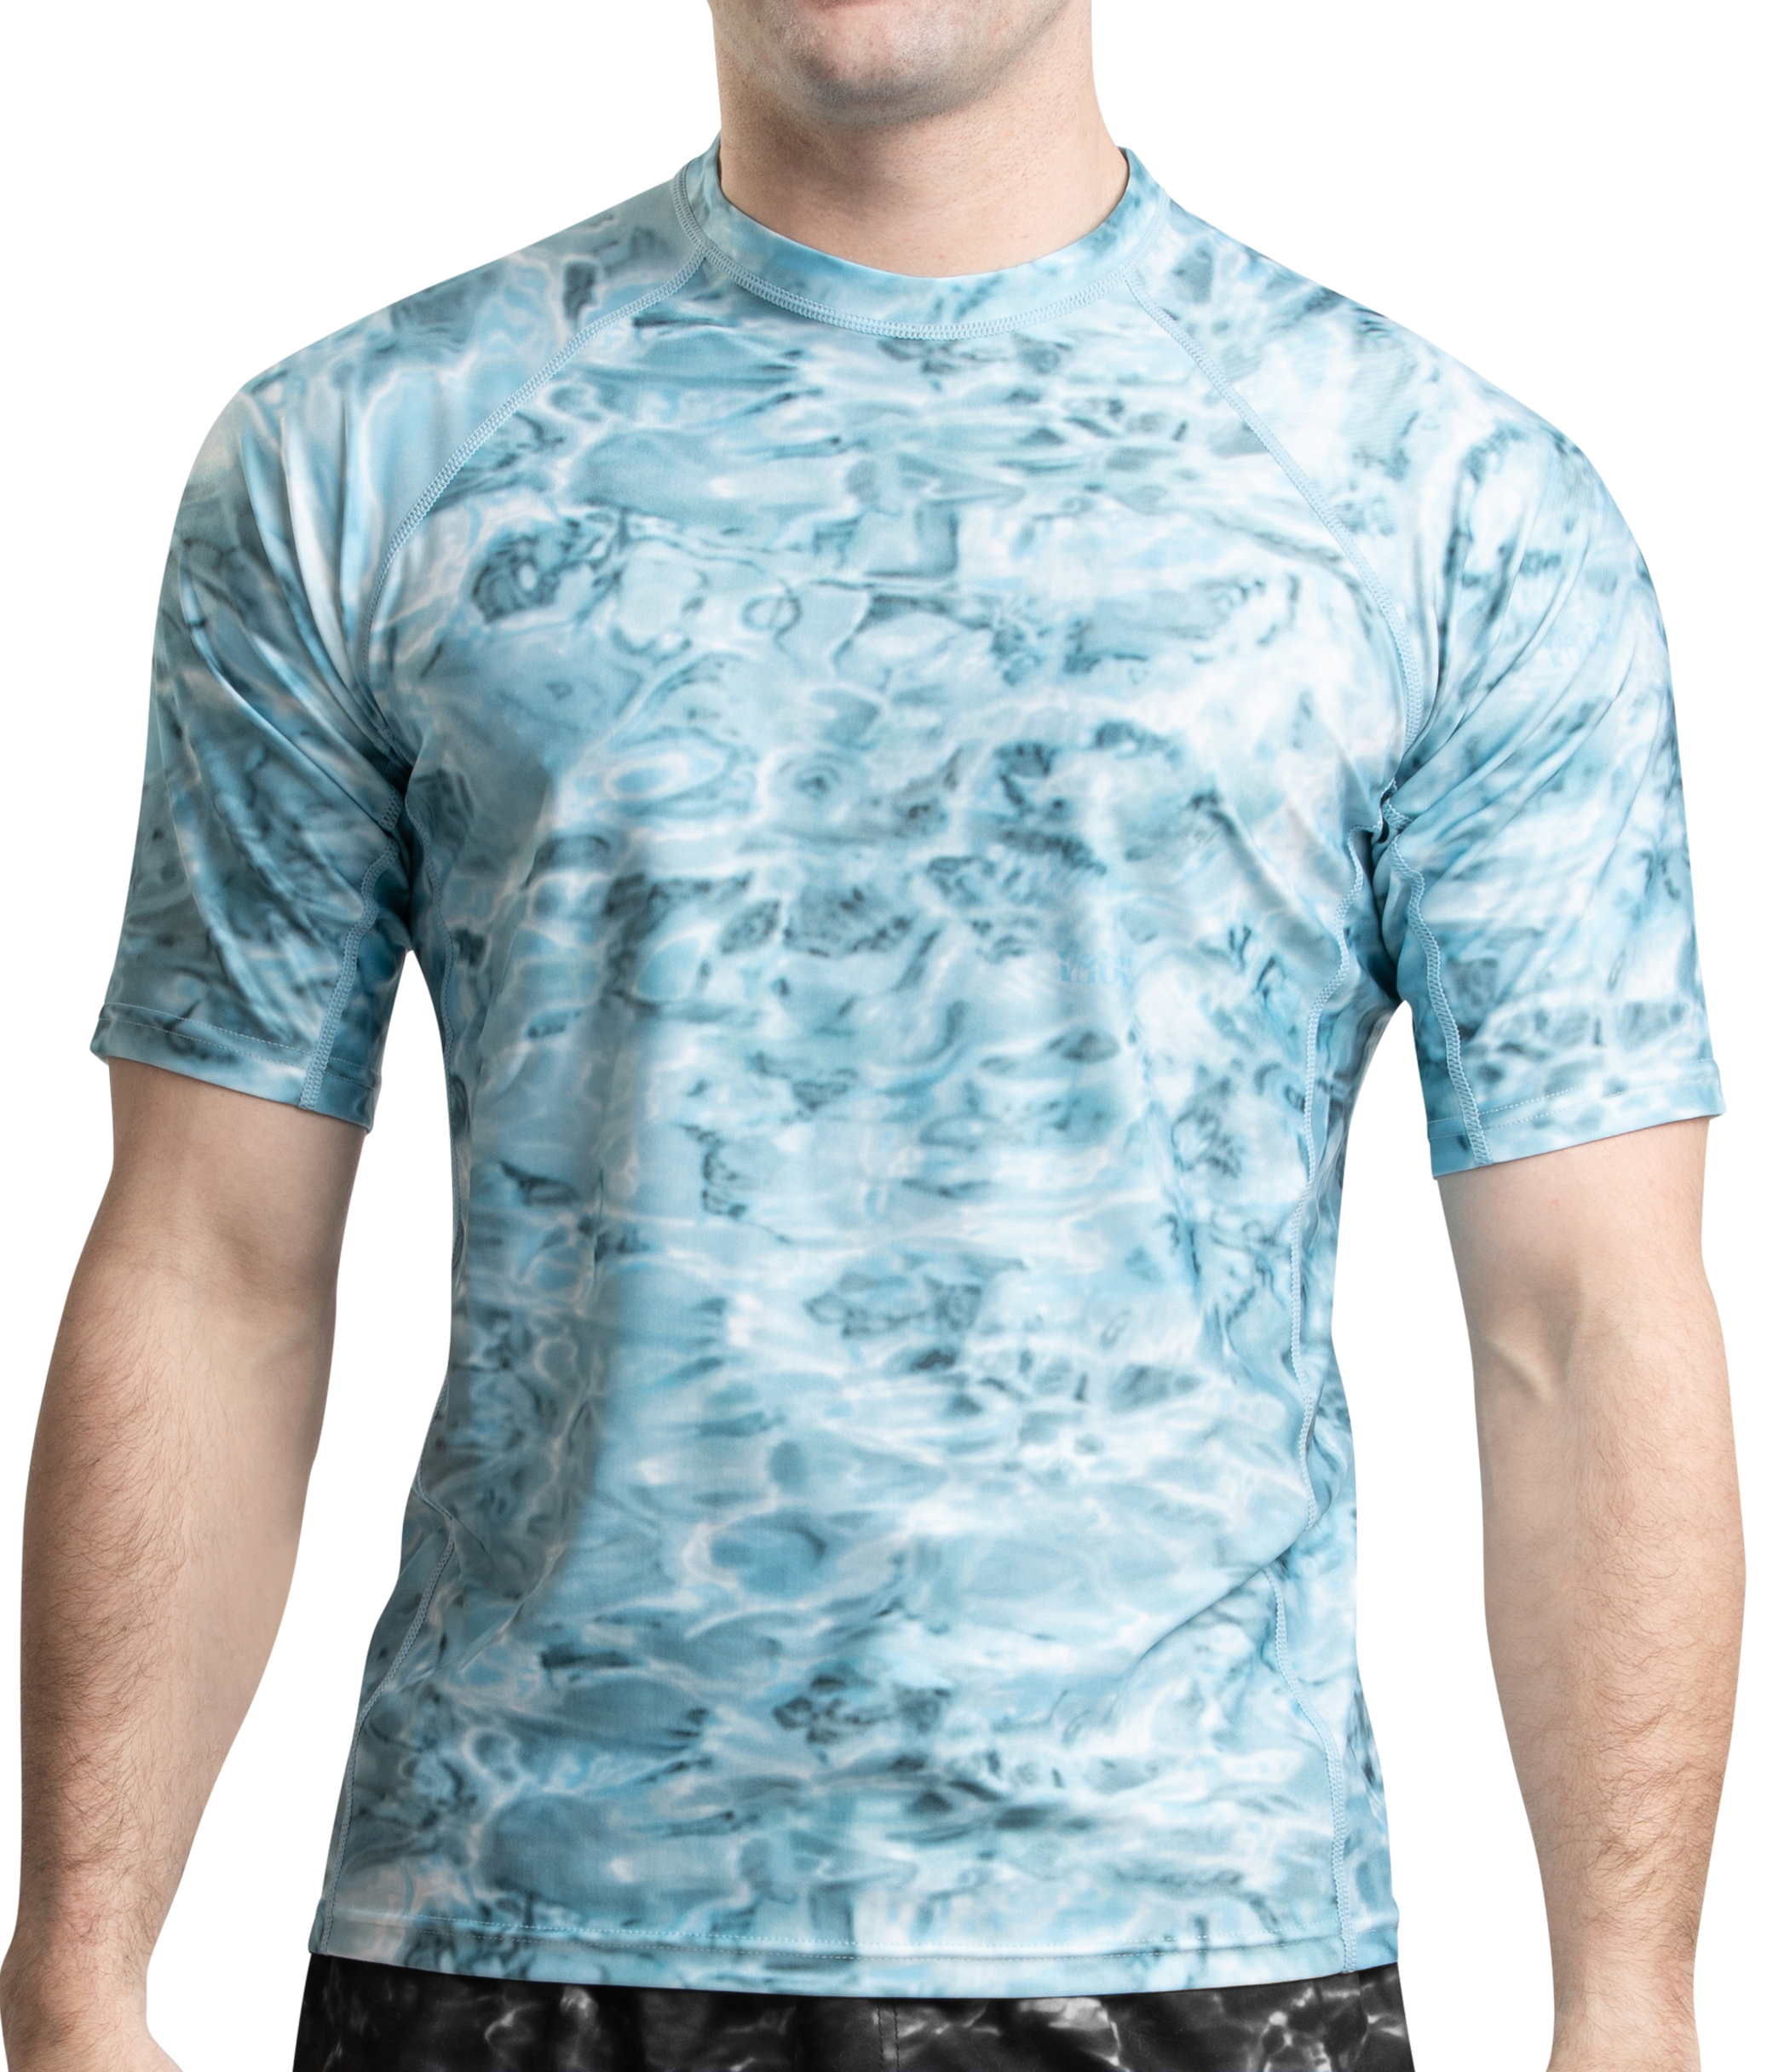 New Tank Shirt, Boardies;Snorkling Dinos Boys 2 pc Swim Set//Outfit - Sz 6-9 mo